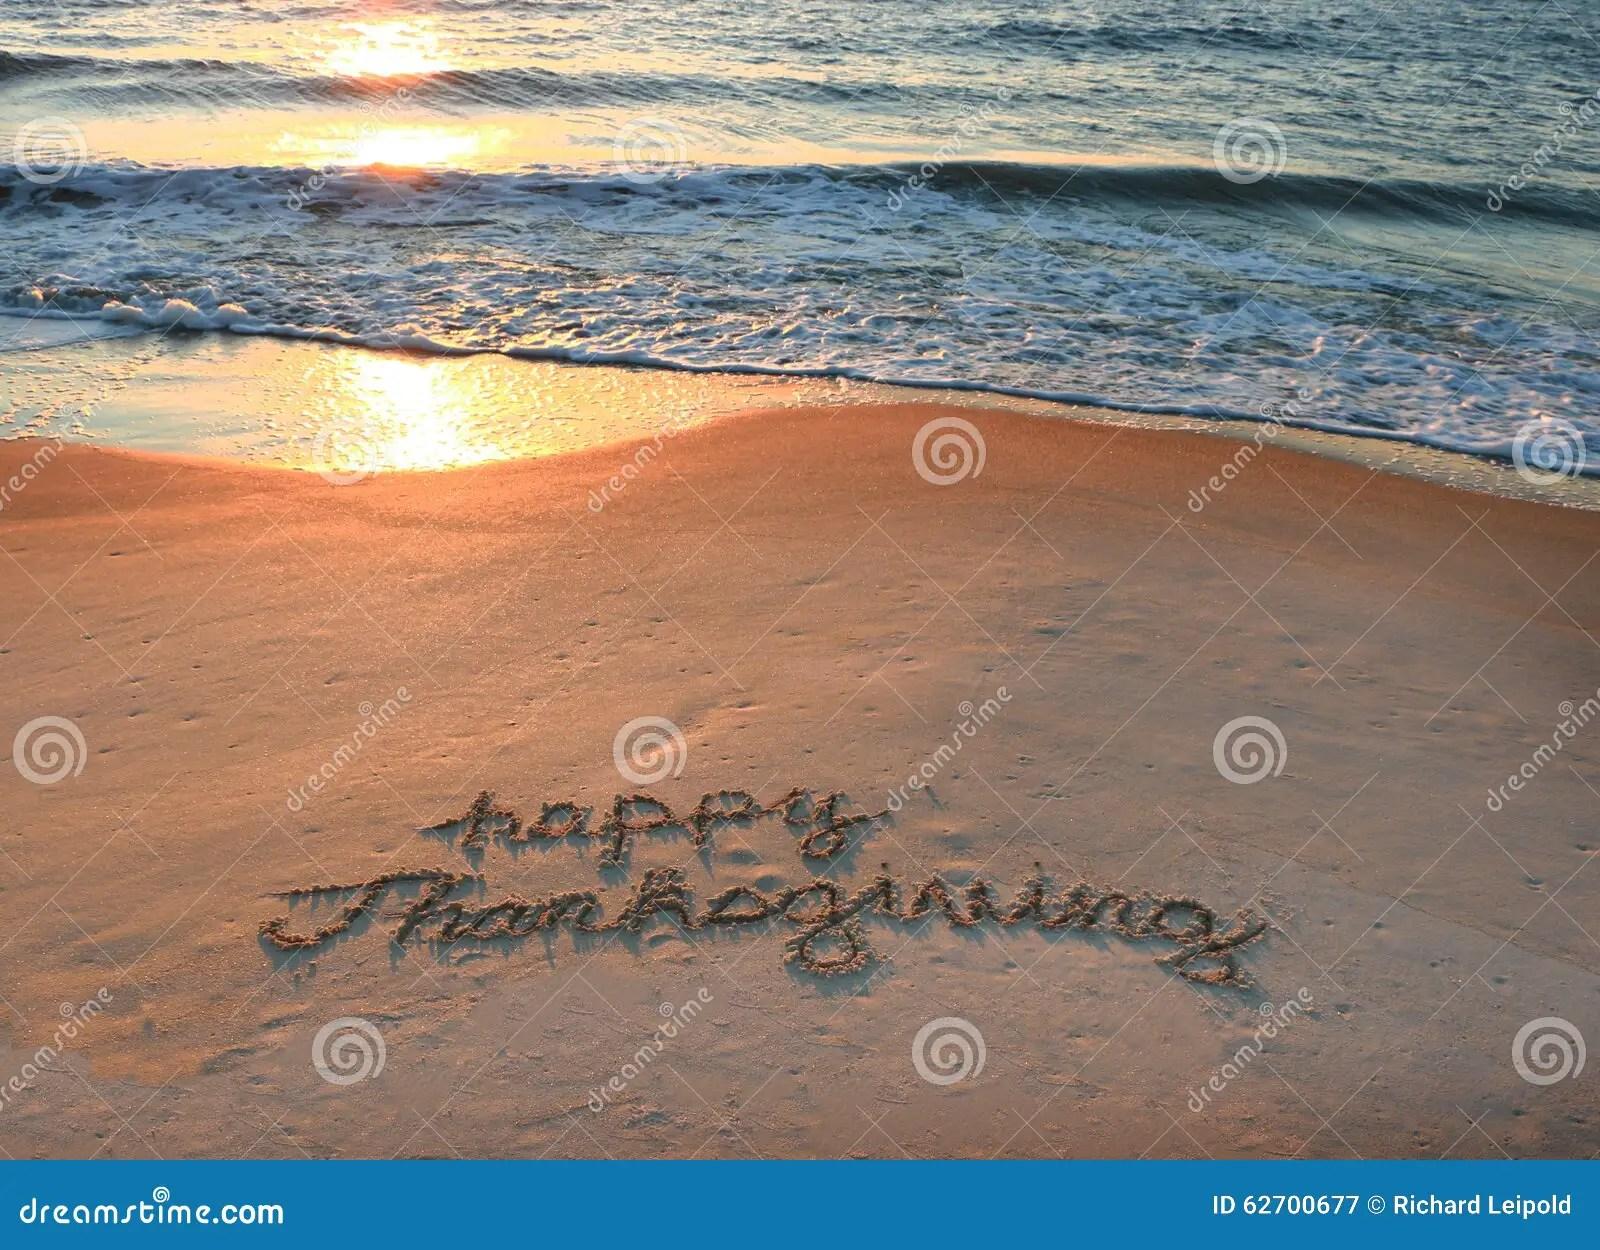 Happy Thanksgiving 3d Wallpaper Happy Thanksgiving Stock Photo Image 62700677